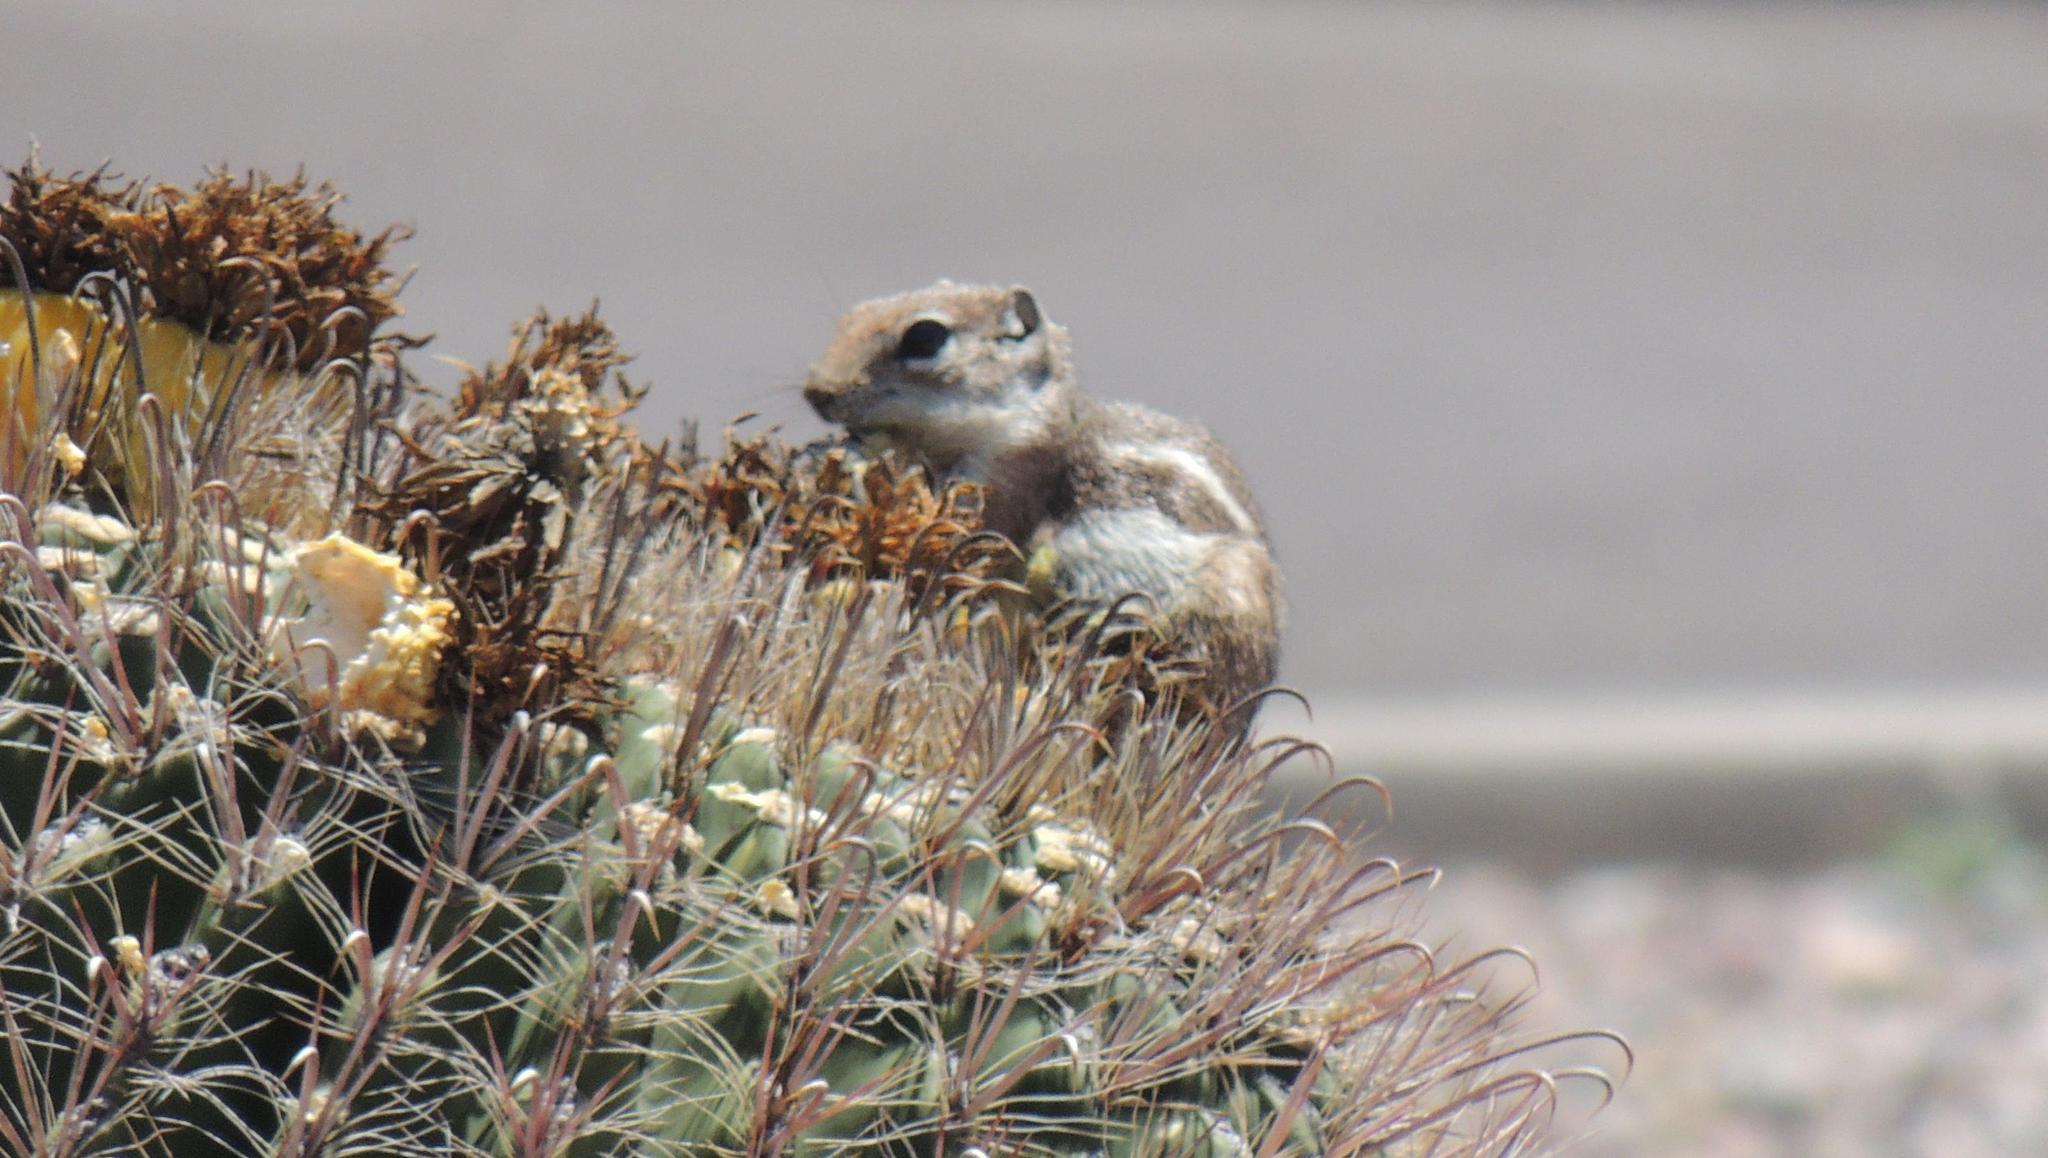 Ground squirrel by sh2020